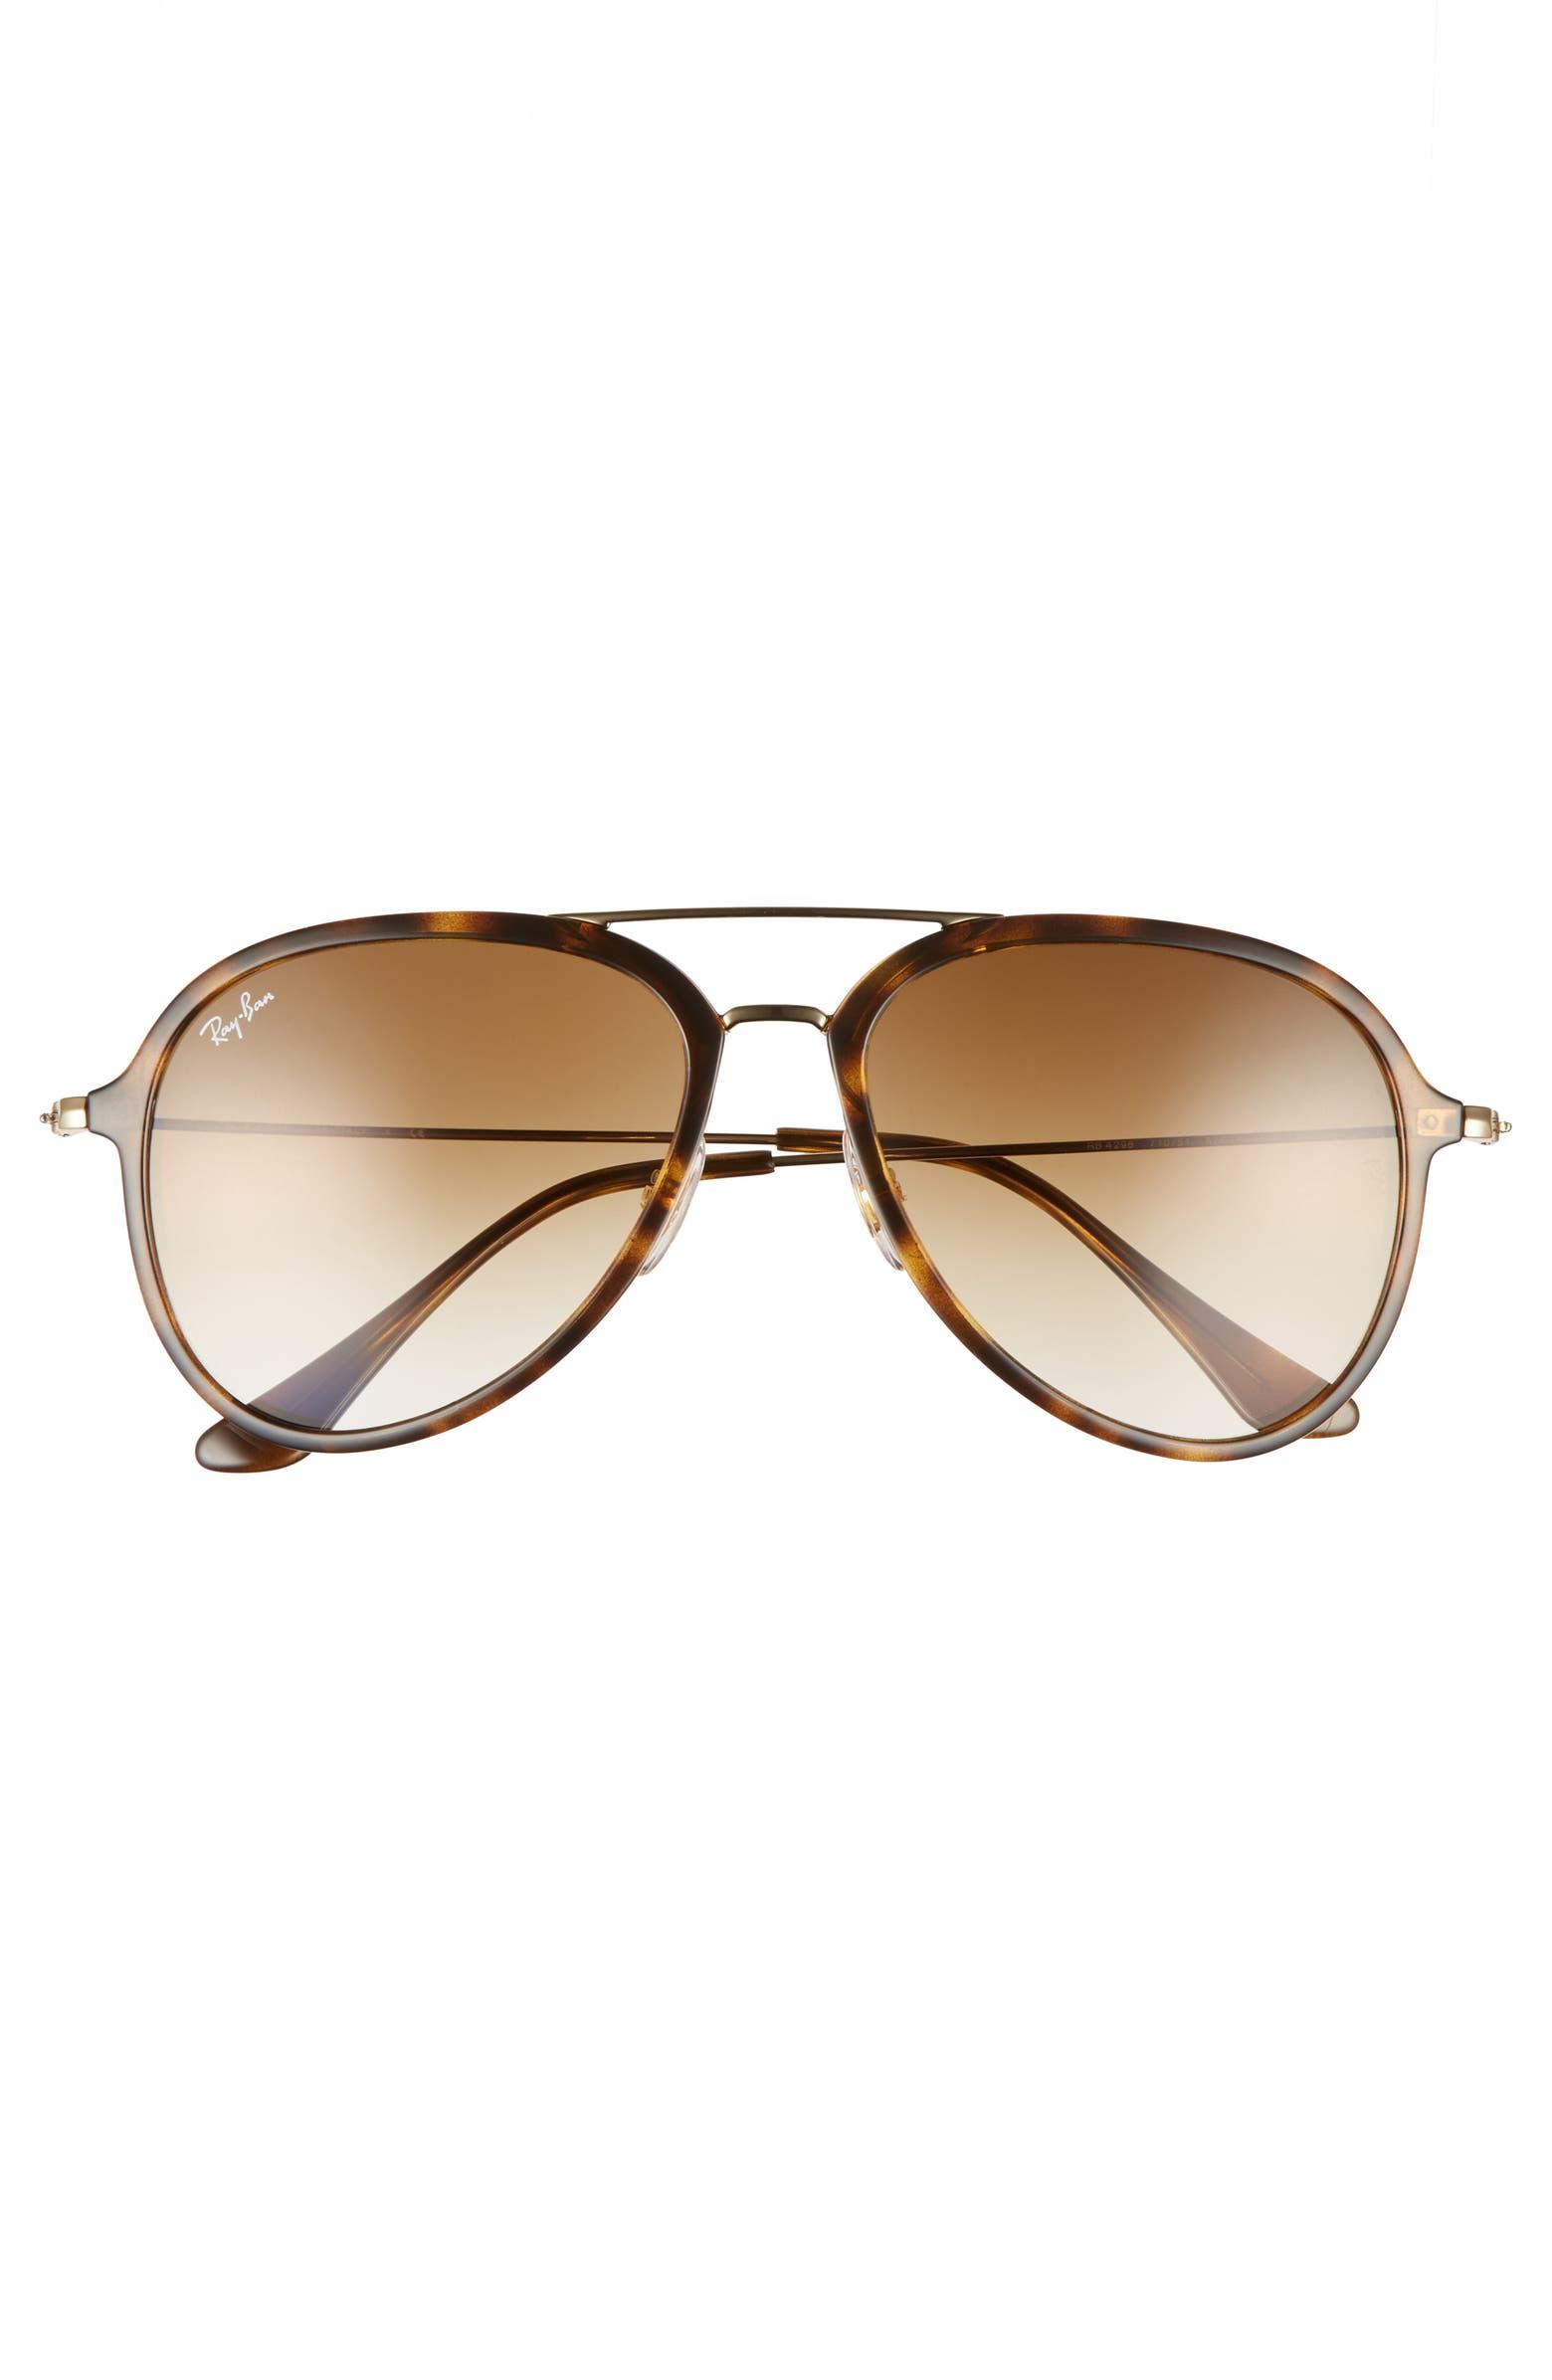 57mm Pilot Sunglasses RAY-BAN